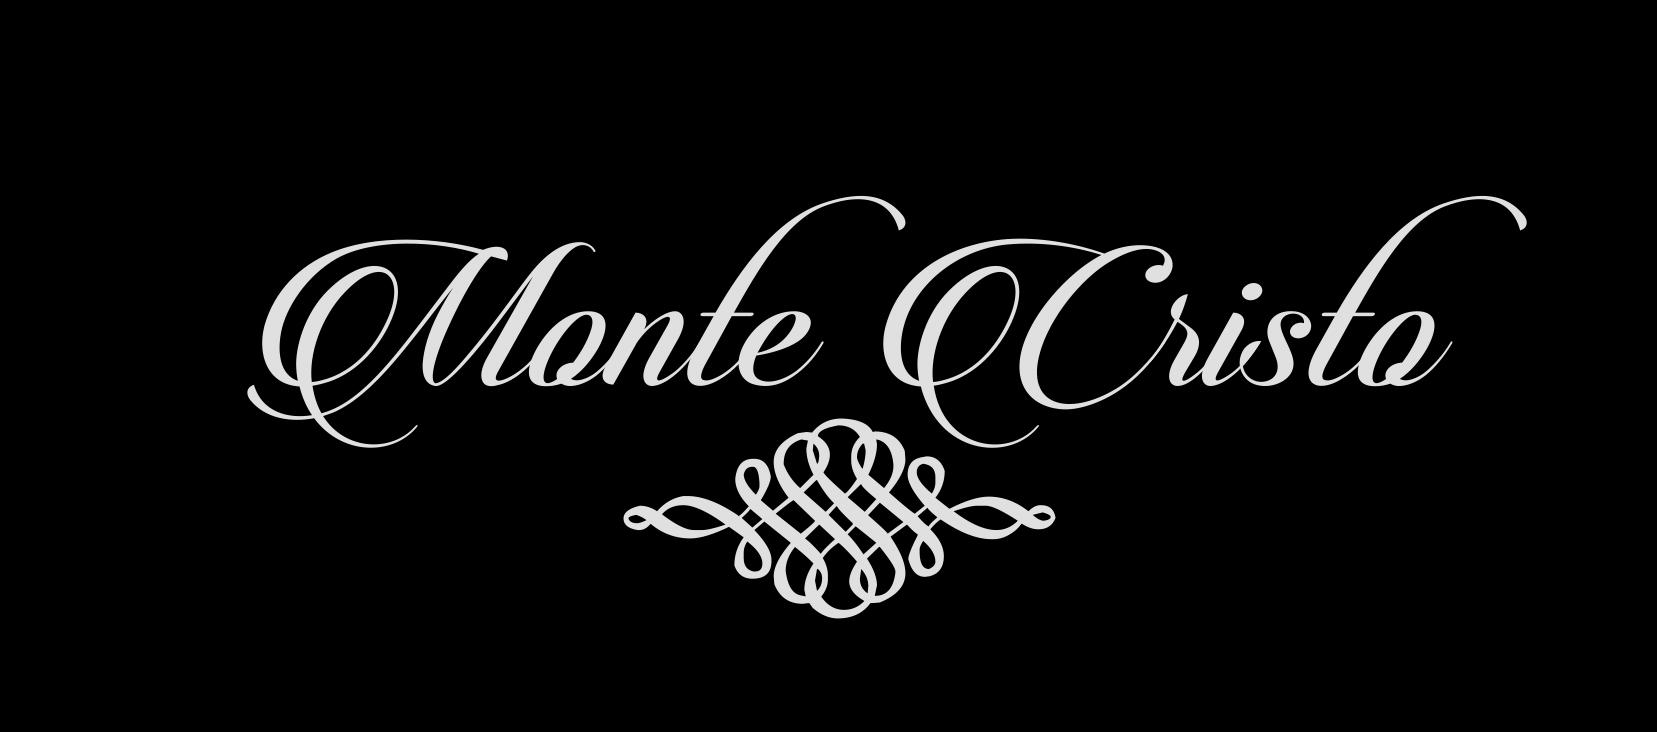 http://www.montecristoevents.com